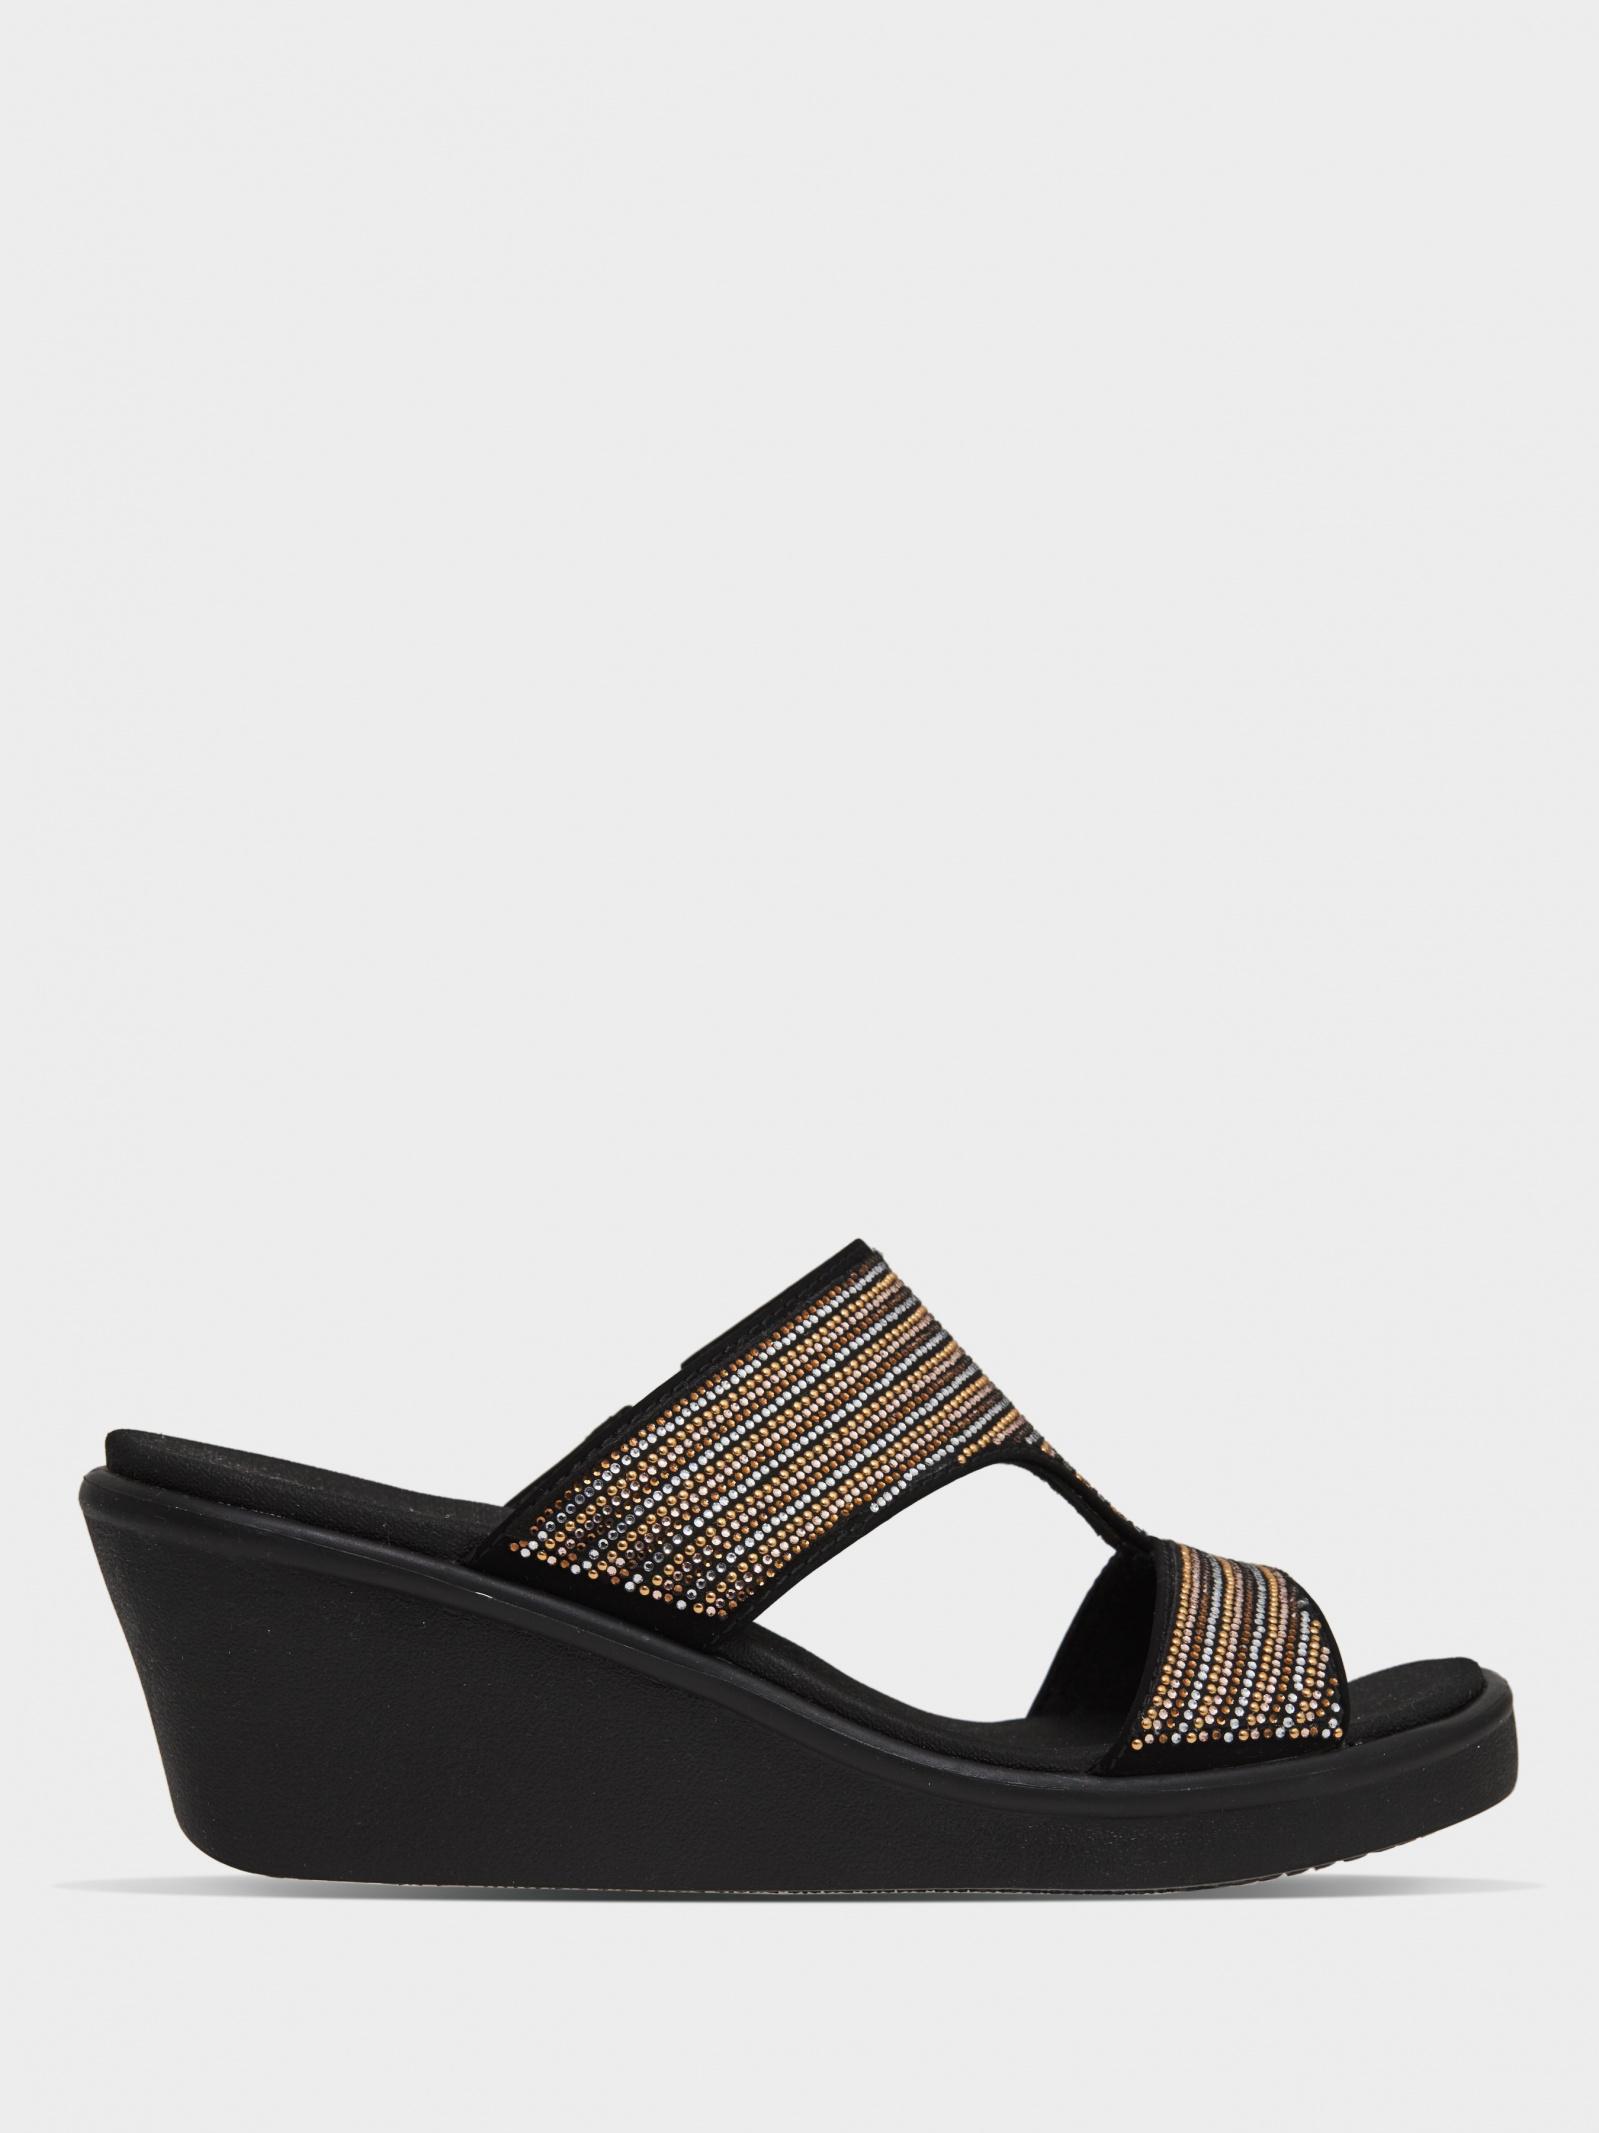 Босоніжки  для жінок Skechers Skechers CALI 119001 BKMT модне взуття, 2017